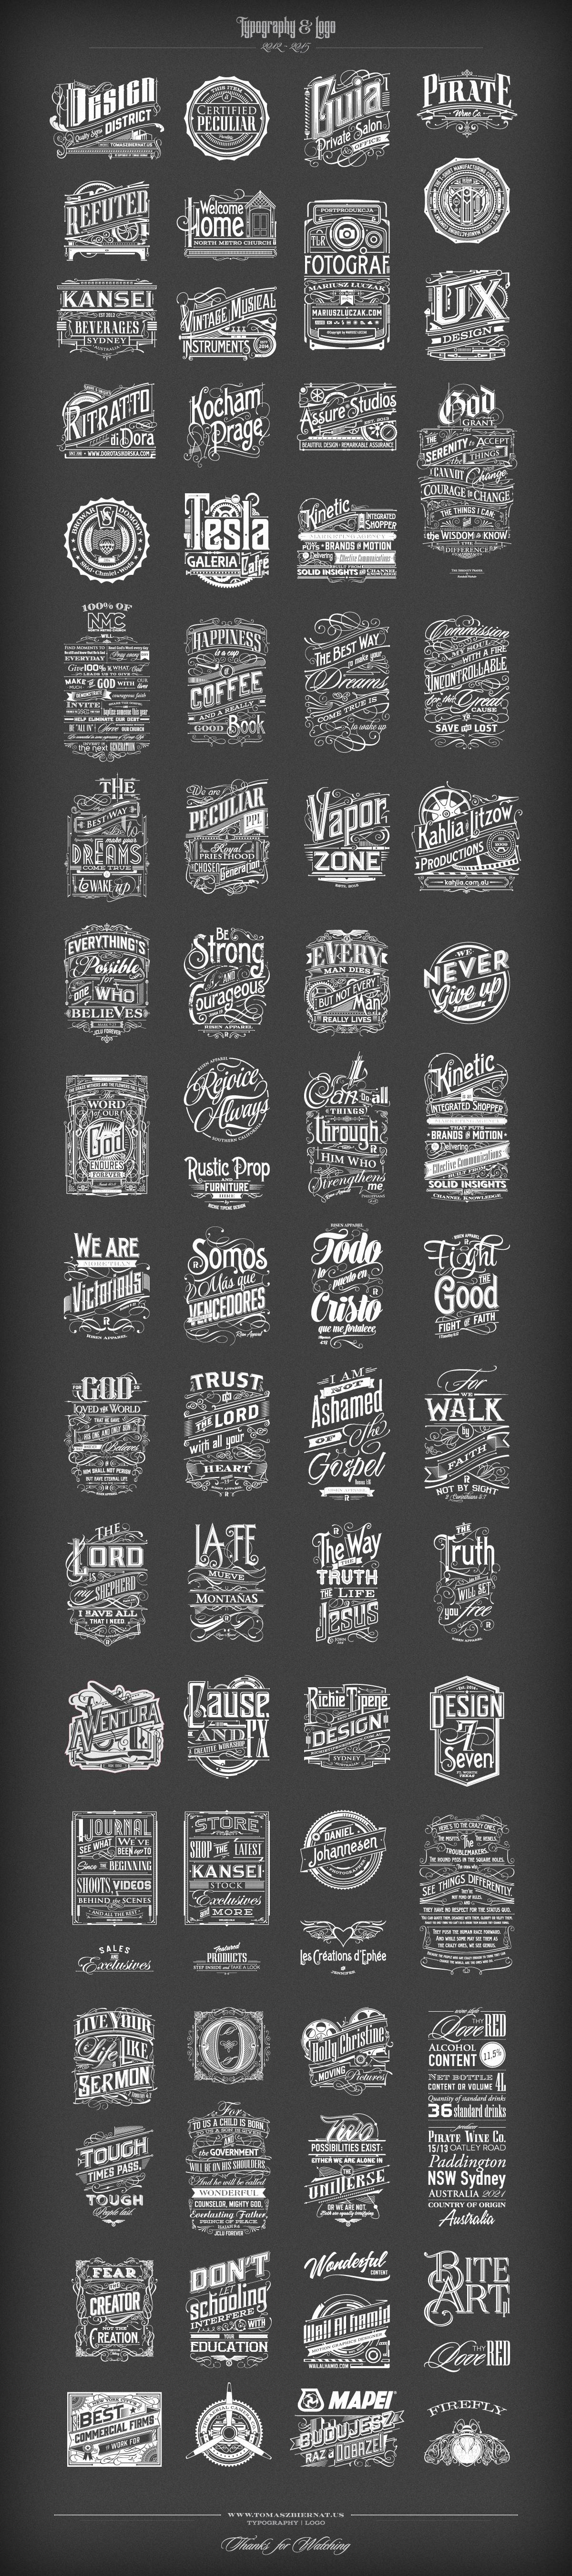 Graphic Design,Print Design,Typography